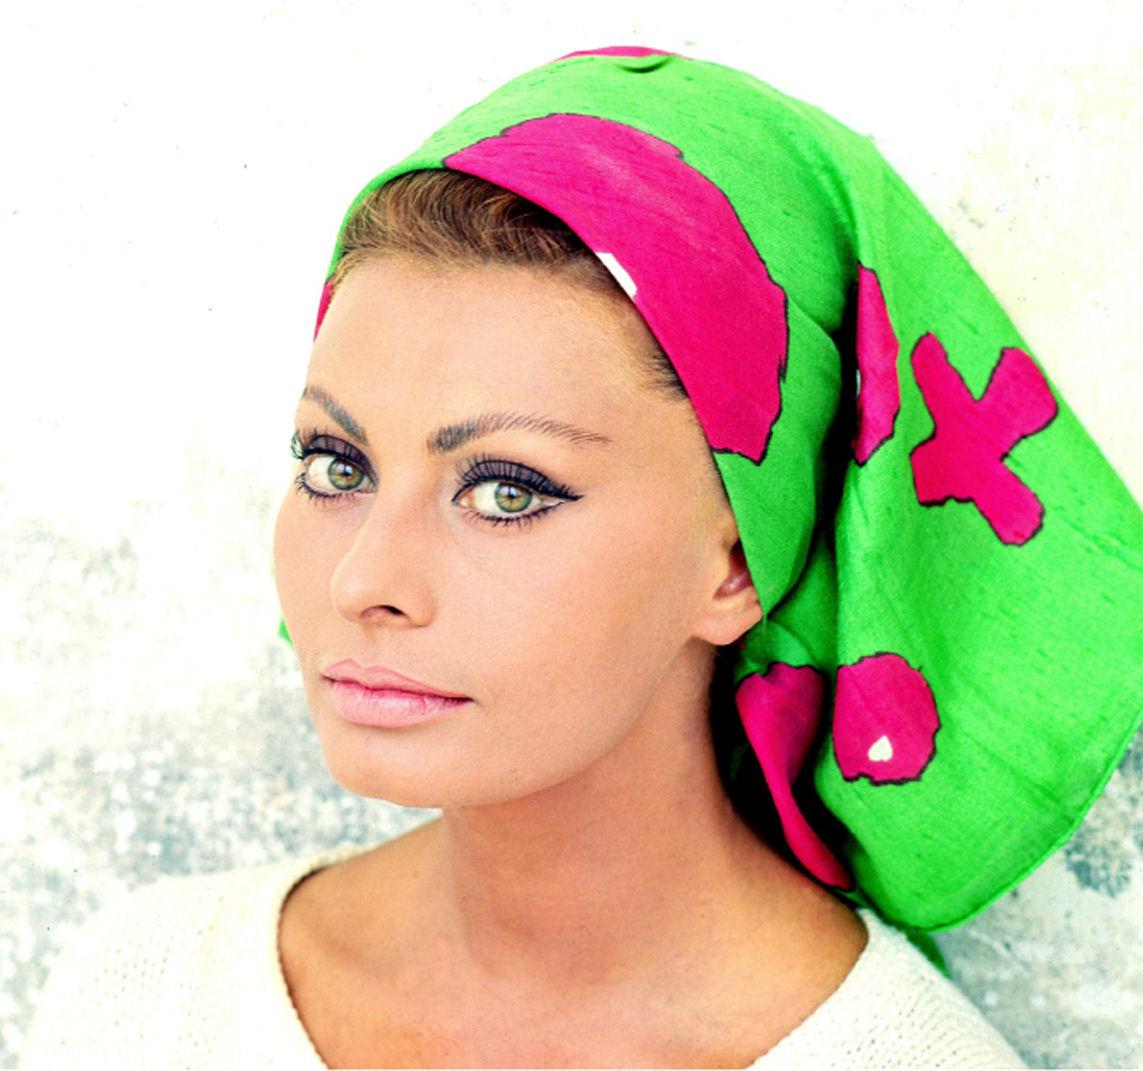 http://3.bp.blogspot.com/-97xvzLuMEps/T9V7R9vHsMI/AAAAAAAAA2Q/cKTNtNk_Ejw/s1600/Sophia_Loren_Scarf.jpg